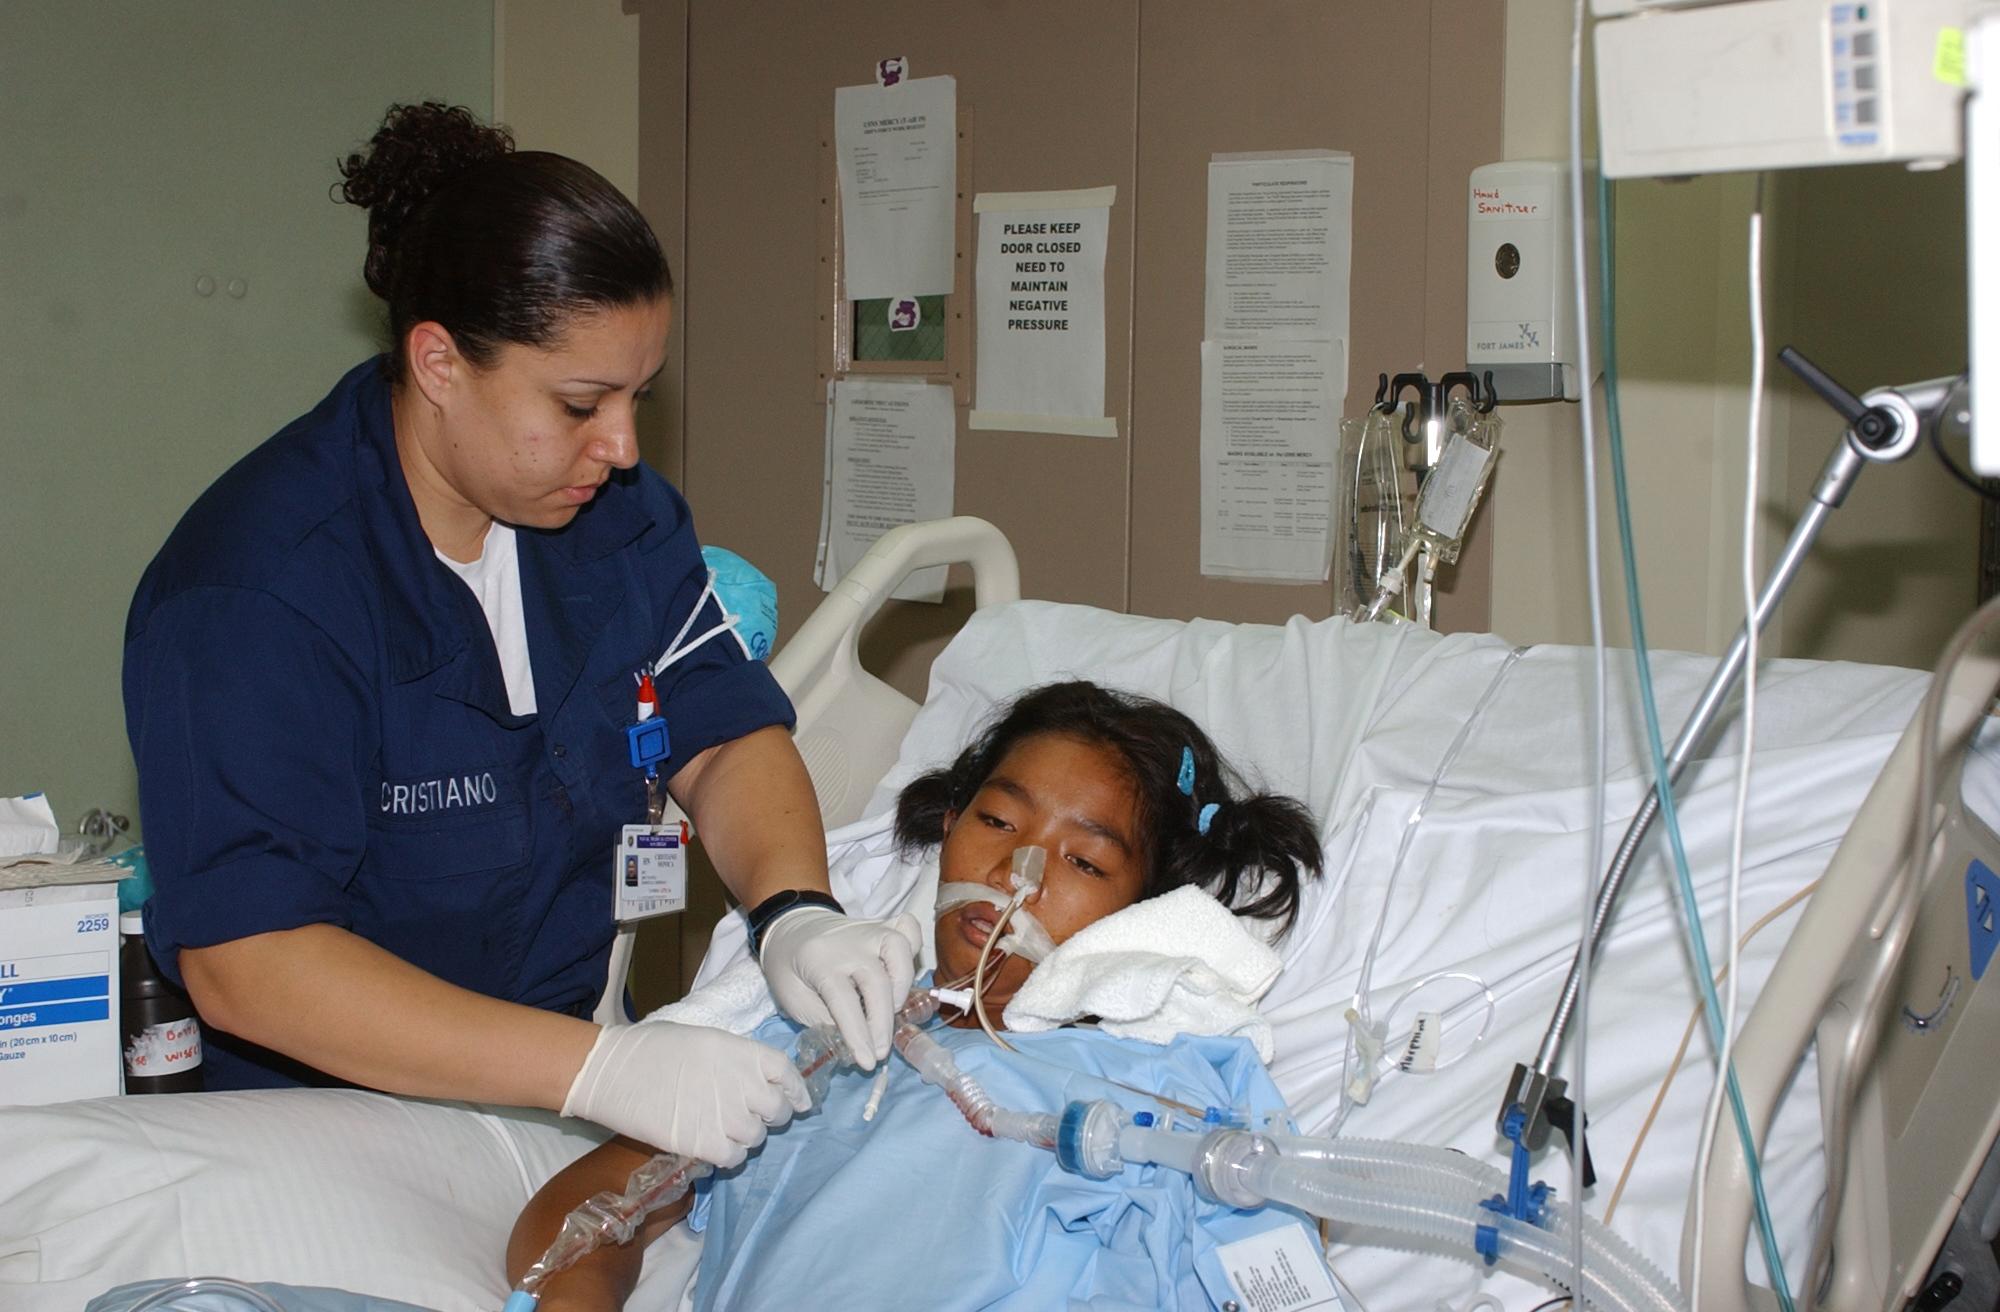 oral care to unconscious patient